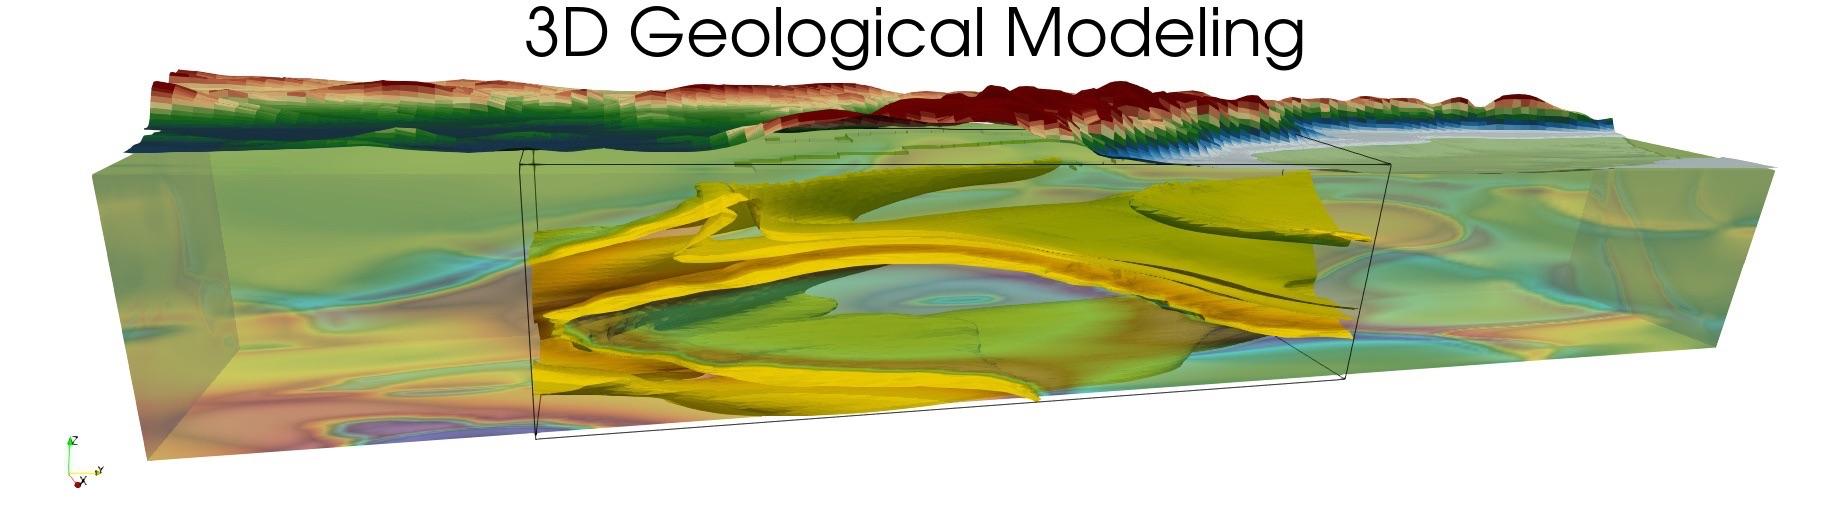 3D Geological Modeling